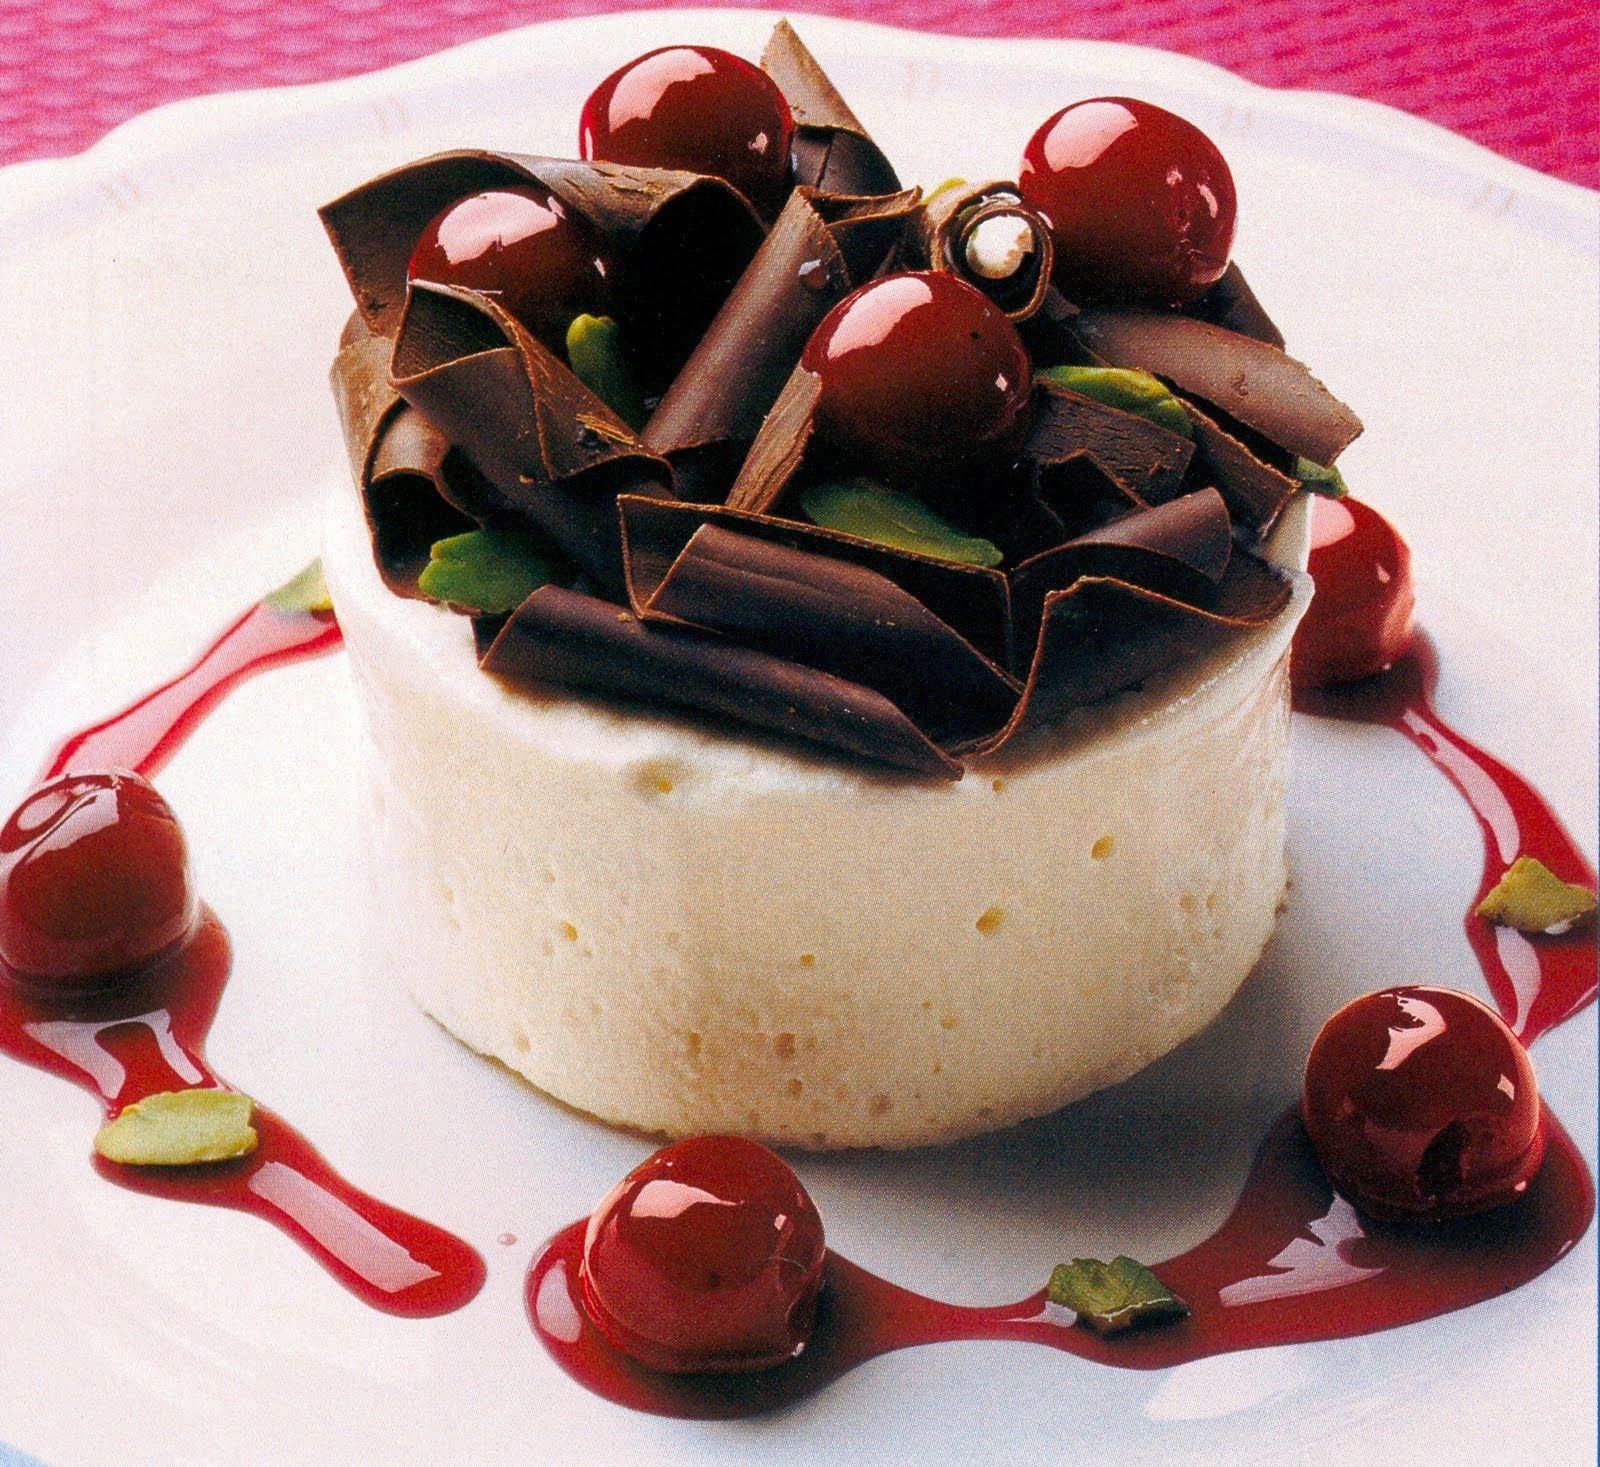 Bestdessertguide Italian Dessert Recipes Sweet Desserts Parfait Desserts Dessert Recipes Easy